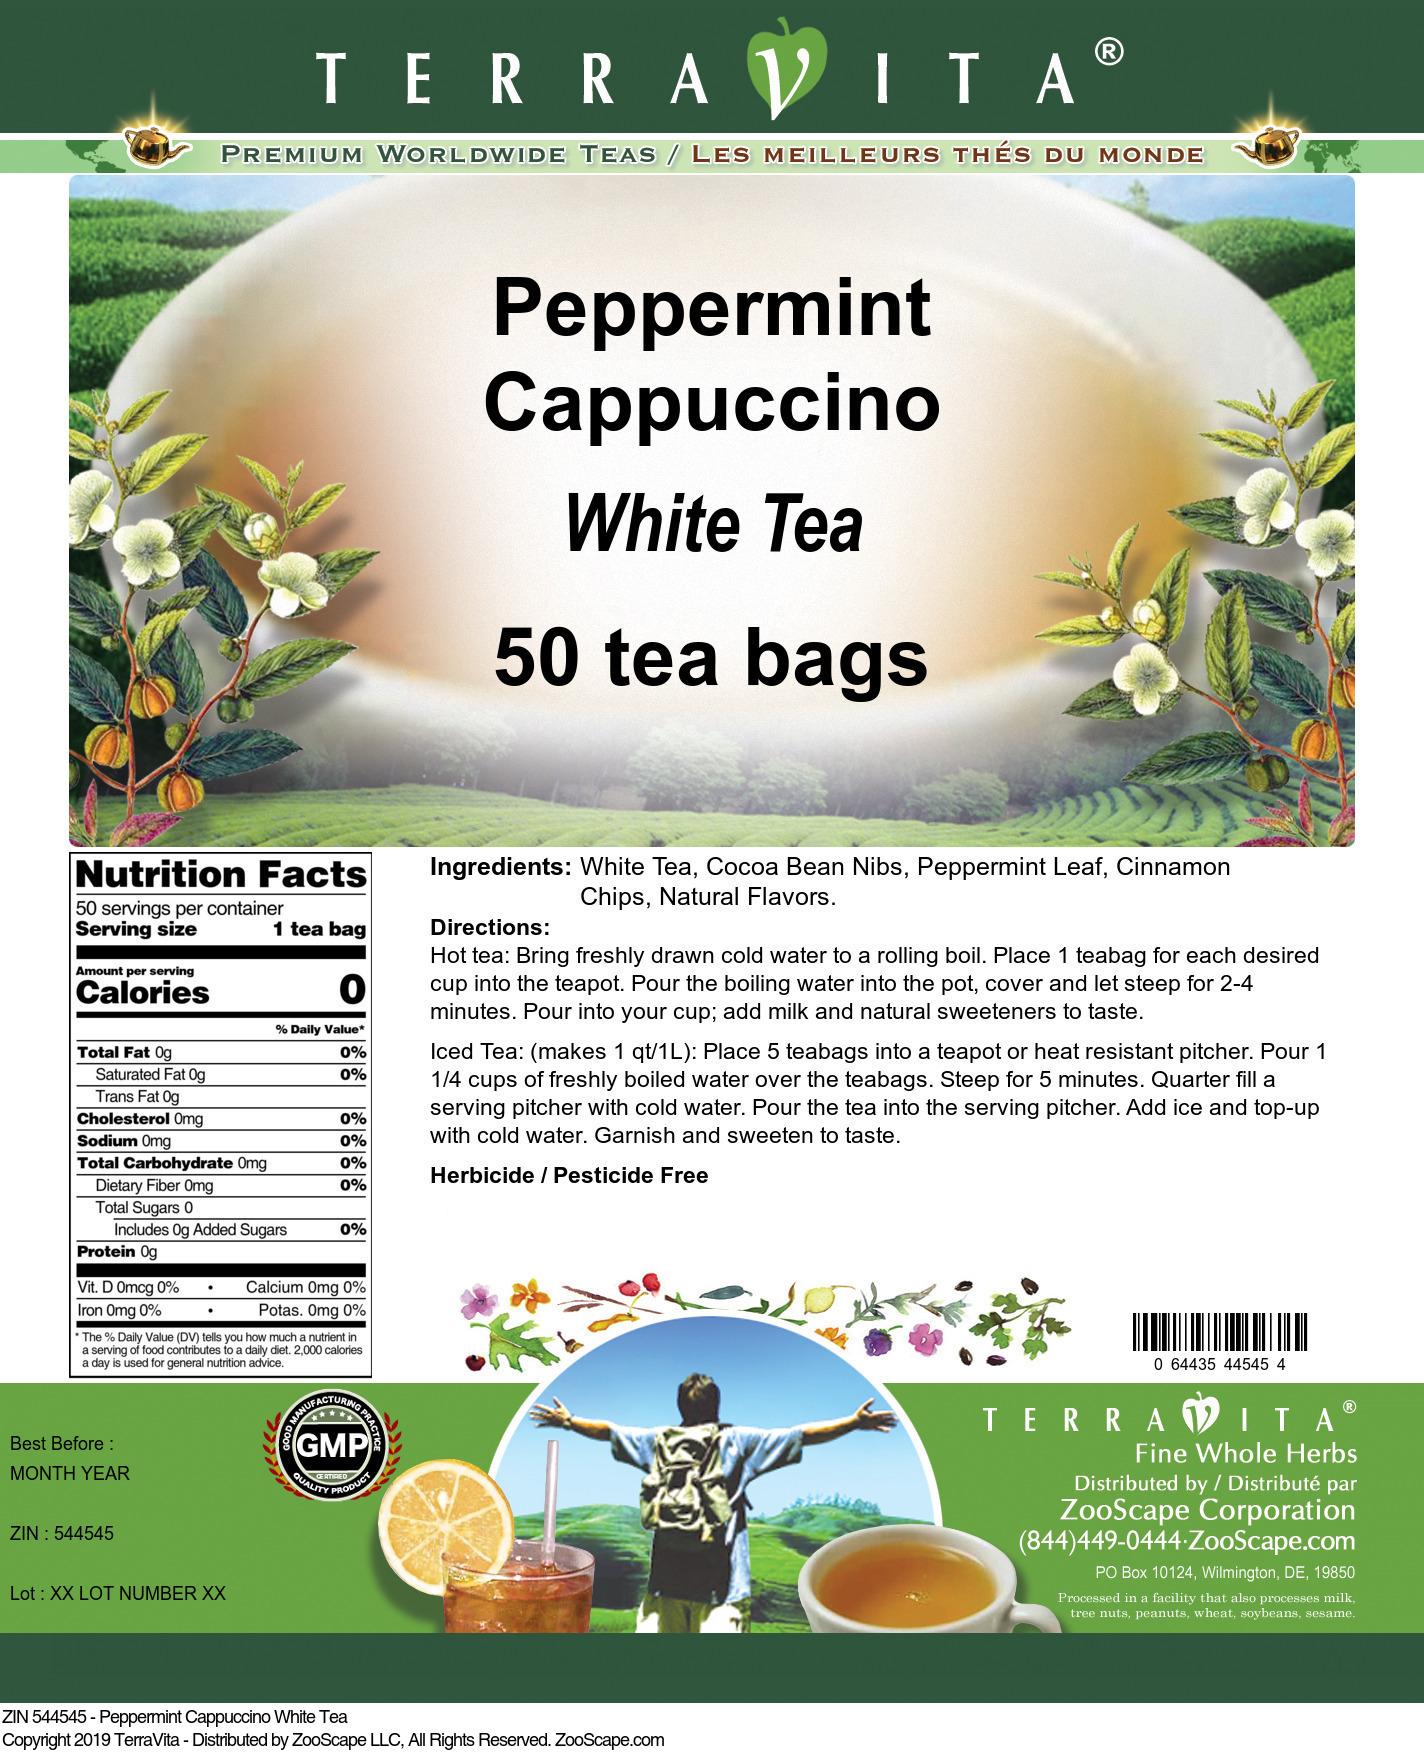 Peppermint Cappuccino White Tea